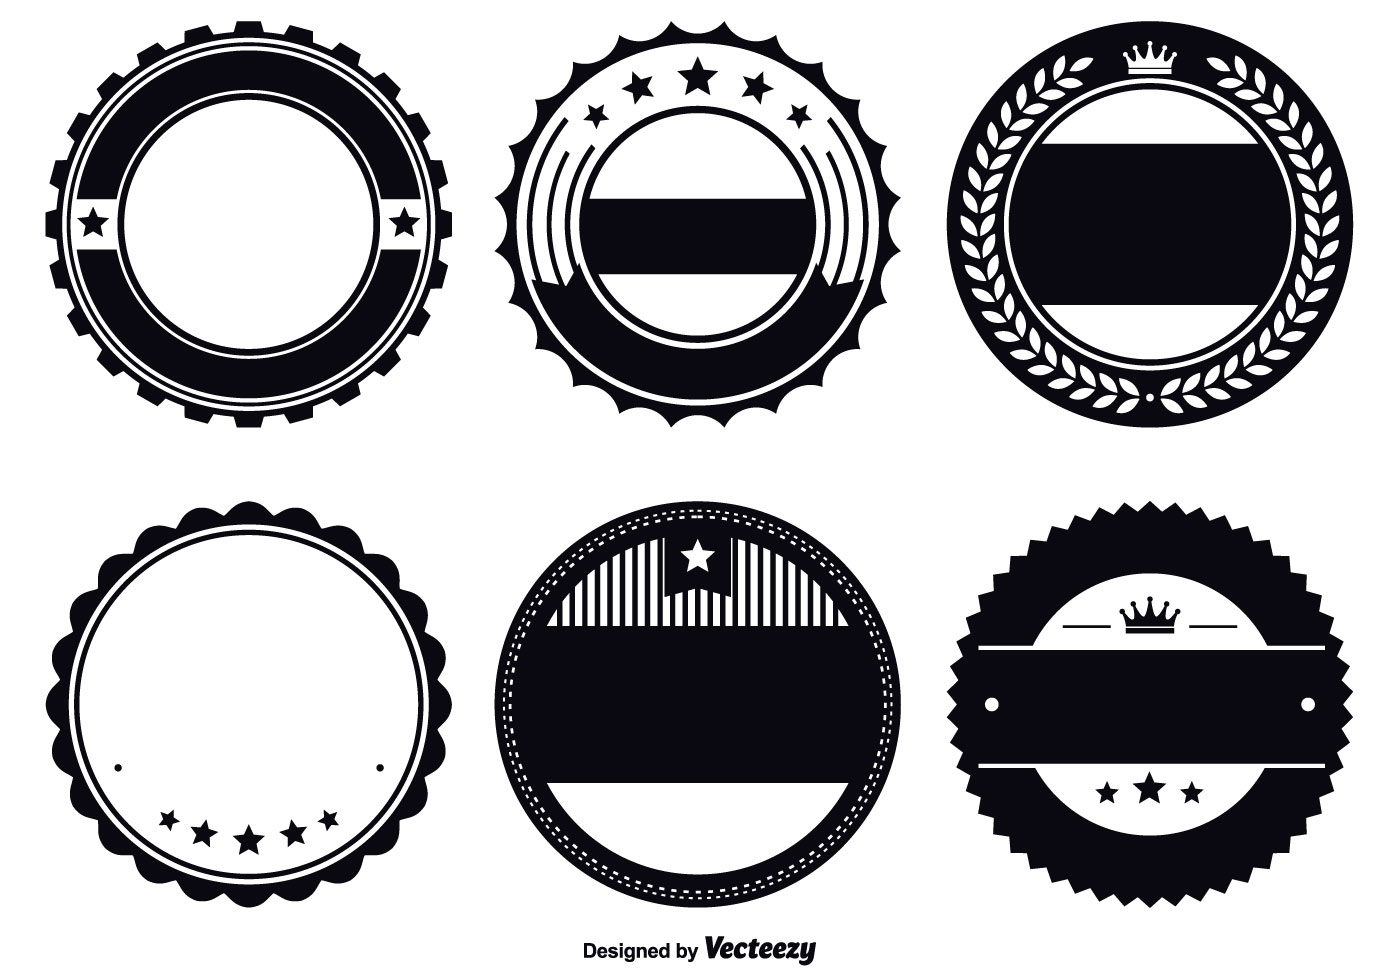 assorted badge template set download free vector art stock graphics images. Black Bedroom Furniture Sets. Home Design Ideas